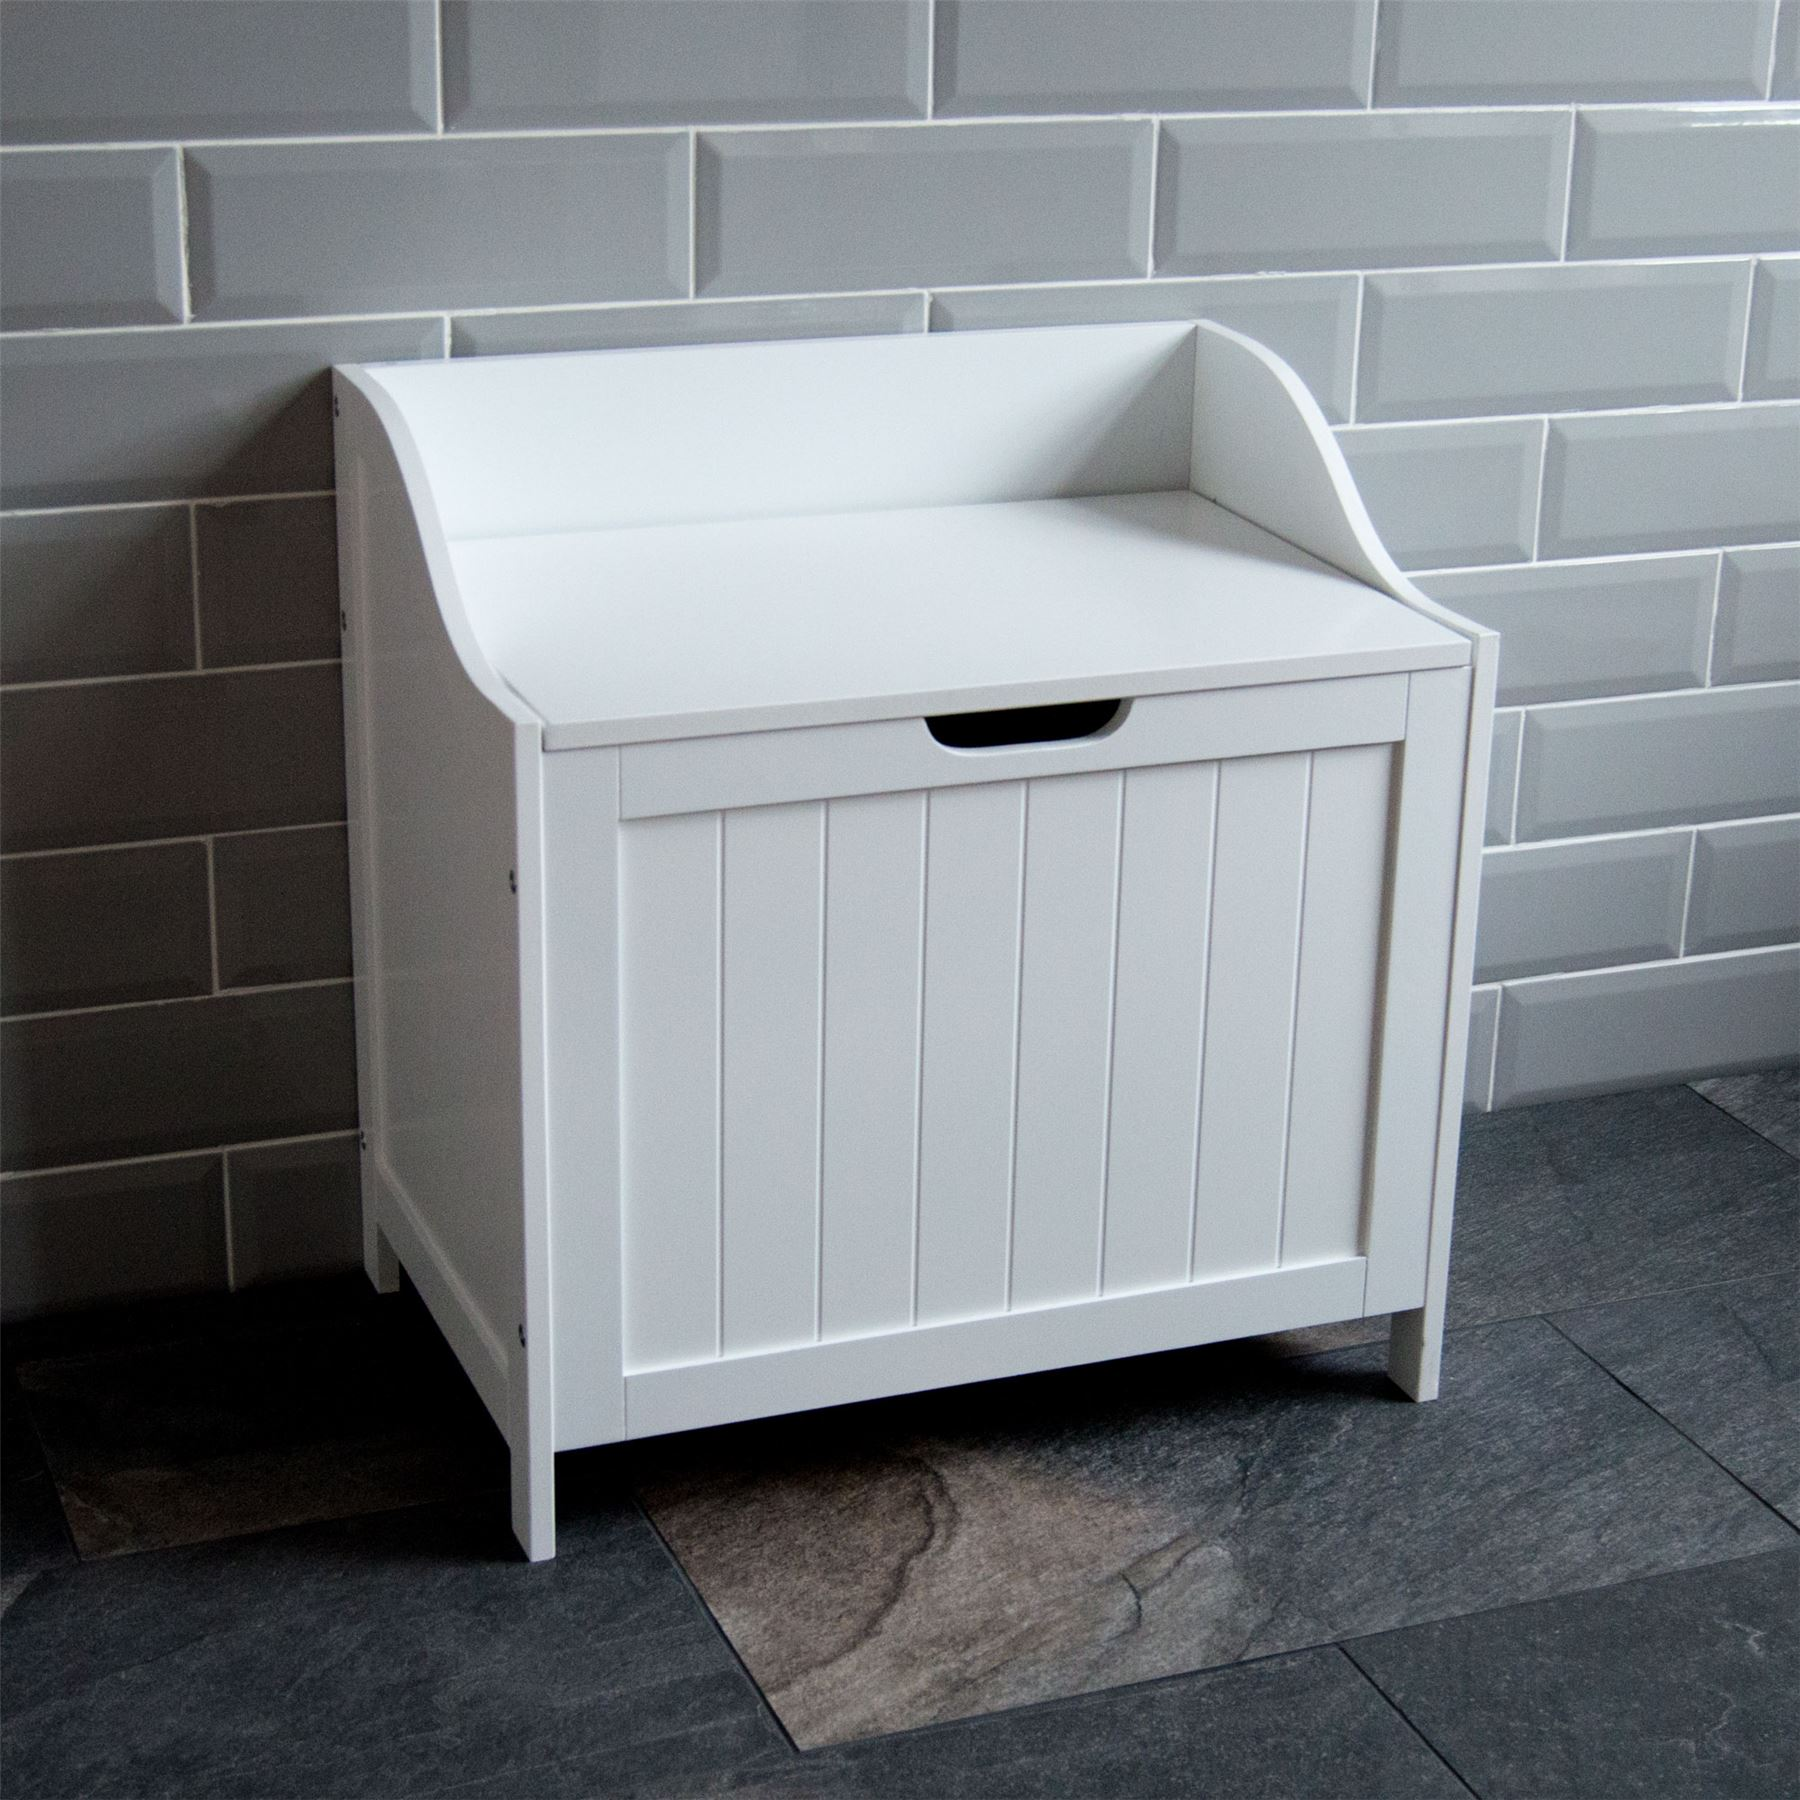 Priano Bathroom Laundry Cabinet Storage Bin Chest Basket Box Furniture White